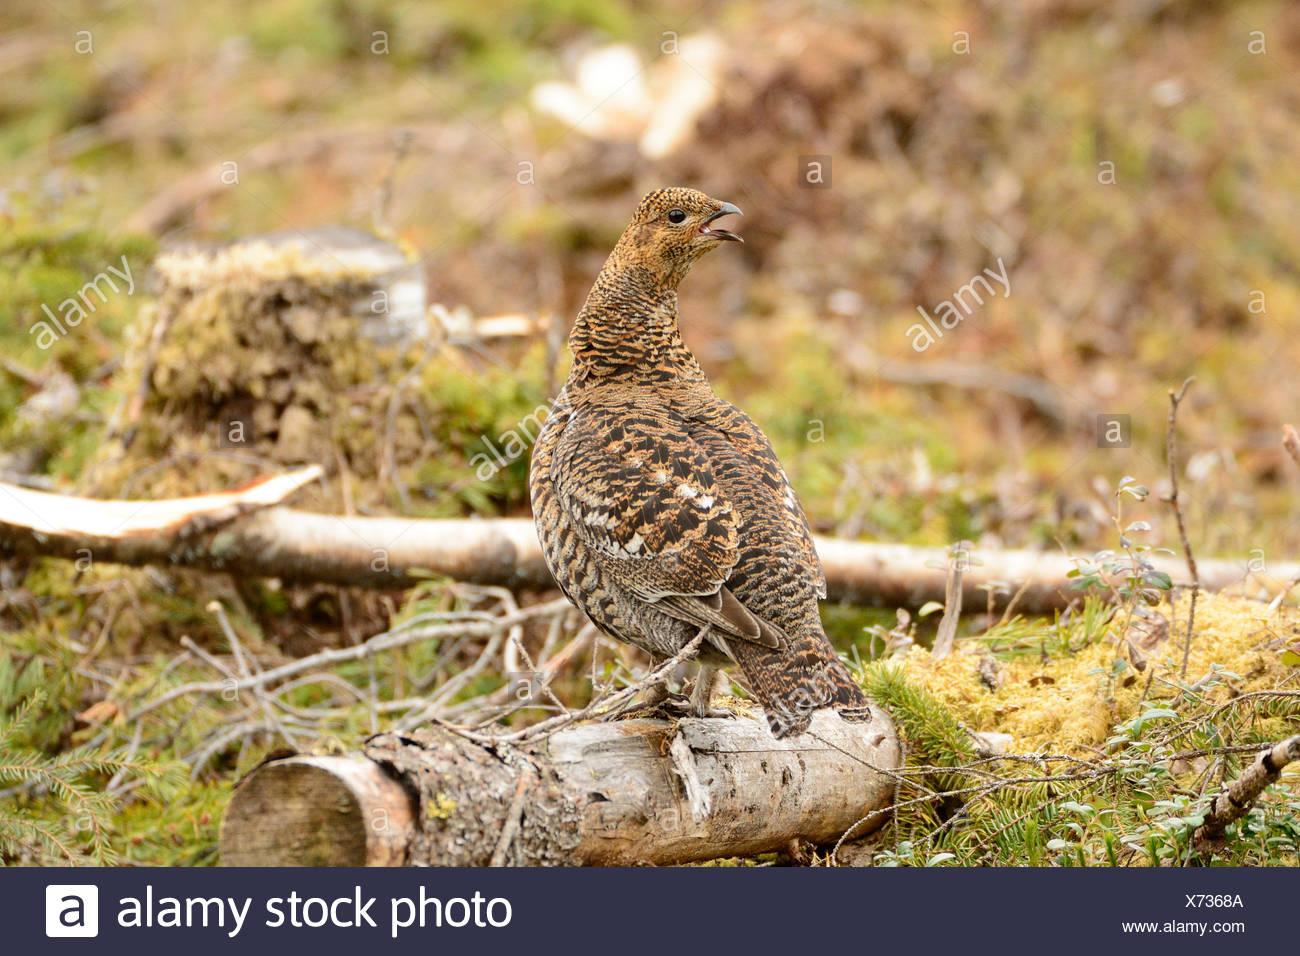 Black Grouse, Grouse, Tetrao tetrix, Tetraonidae, hen, bird, animal, Bograngen, Värmland, Sweden - Stock Image